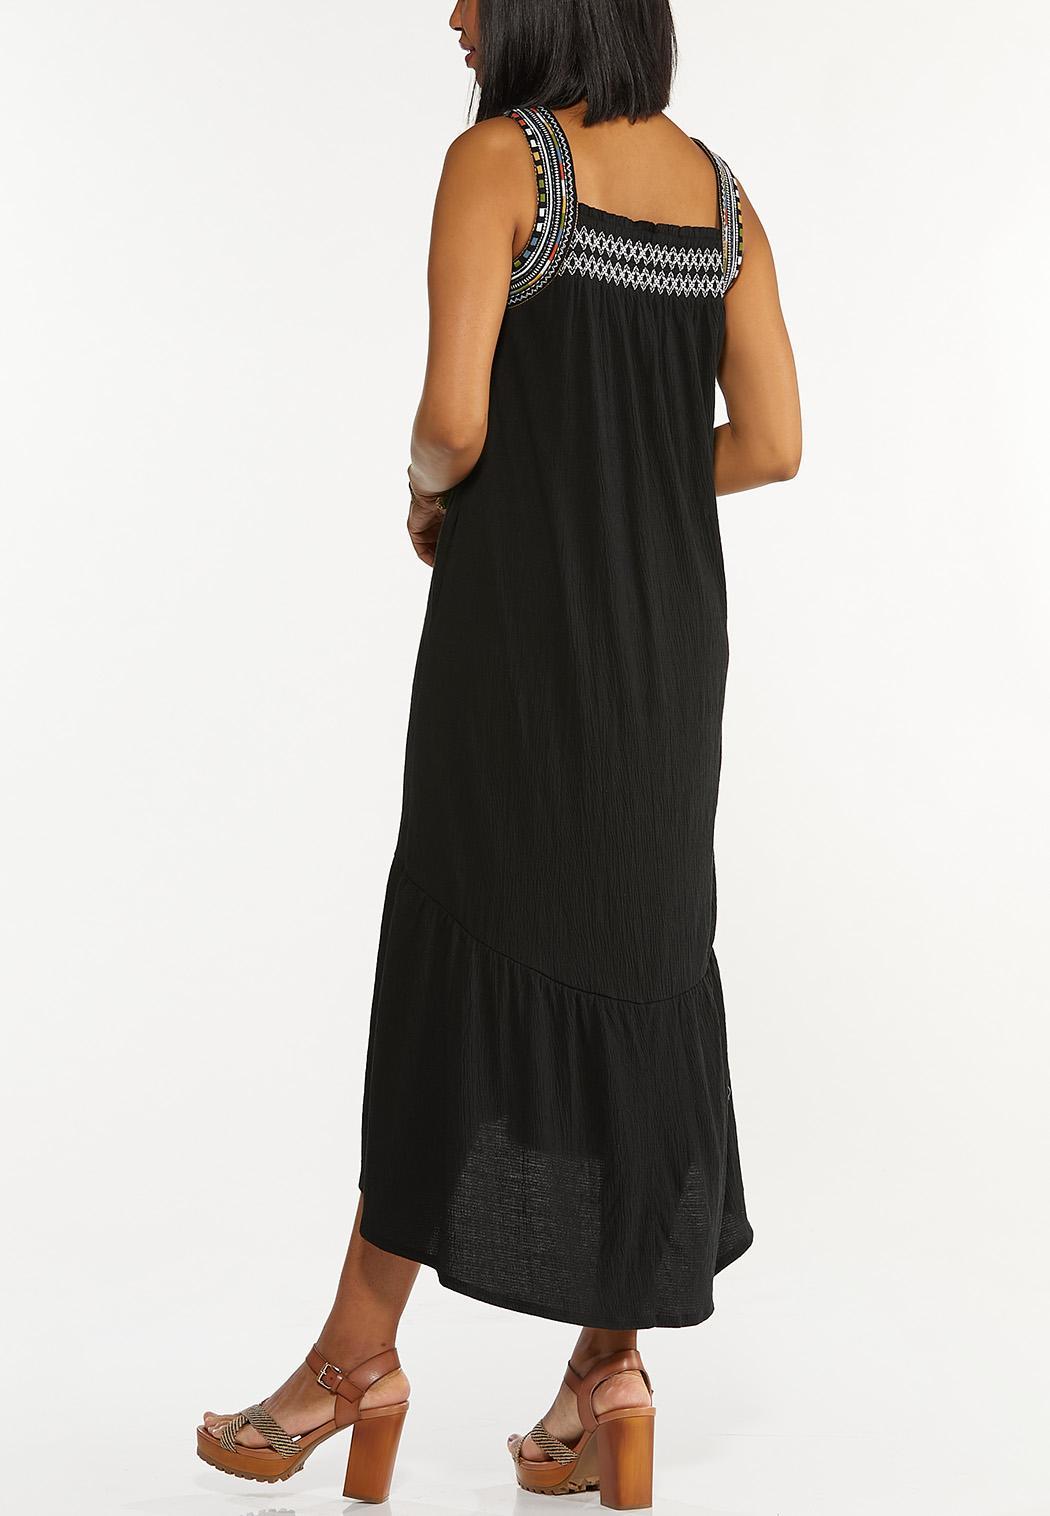 Gauzy Embroidered Dress (Item #44293135)